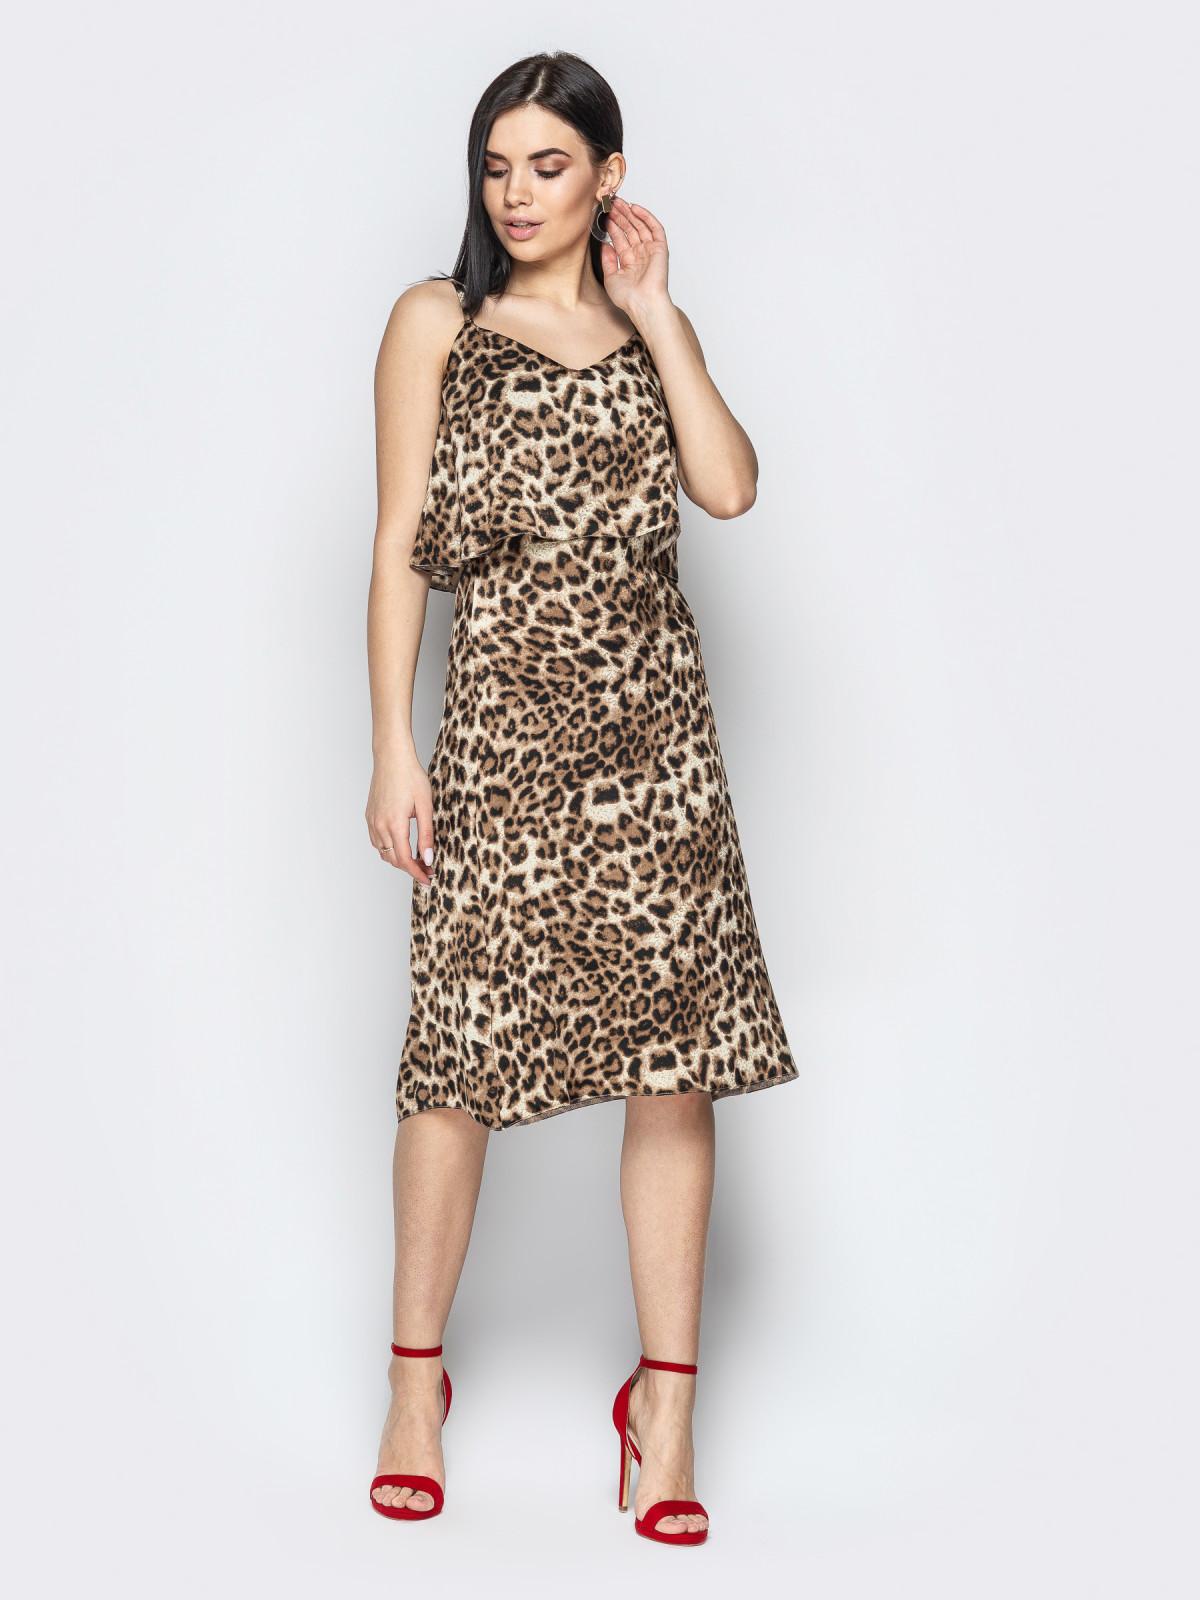 Сарафан Afina леопард бежевый